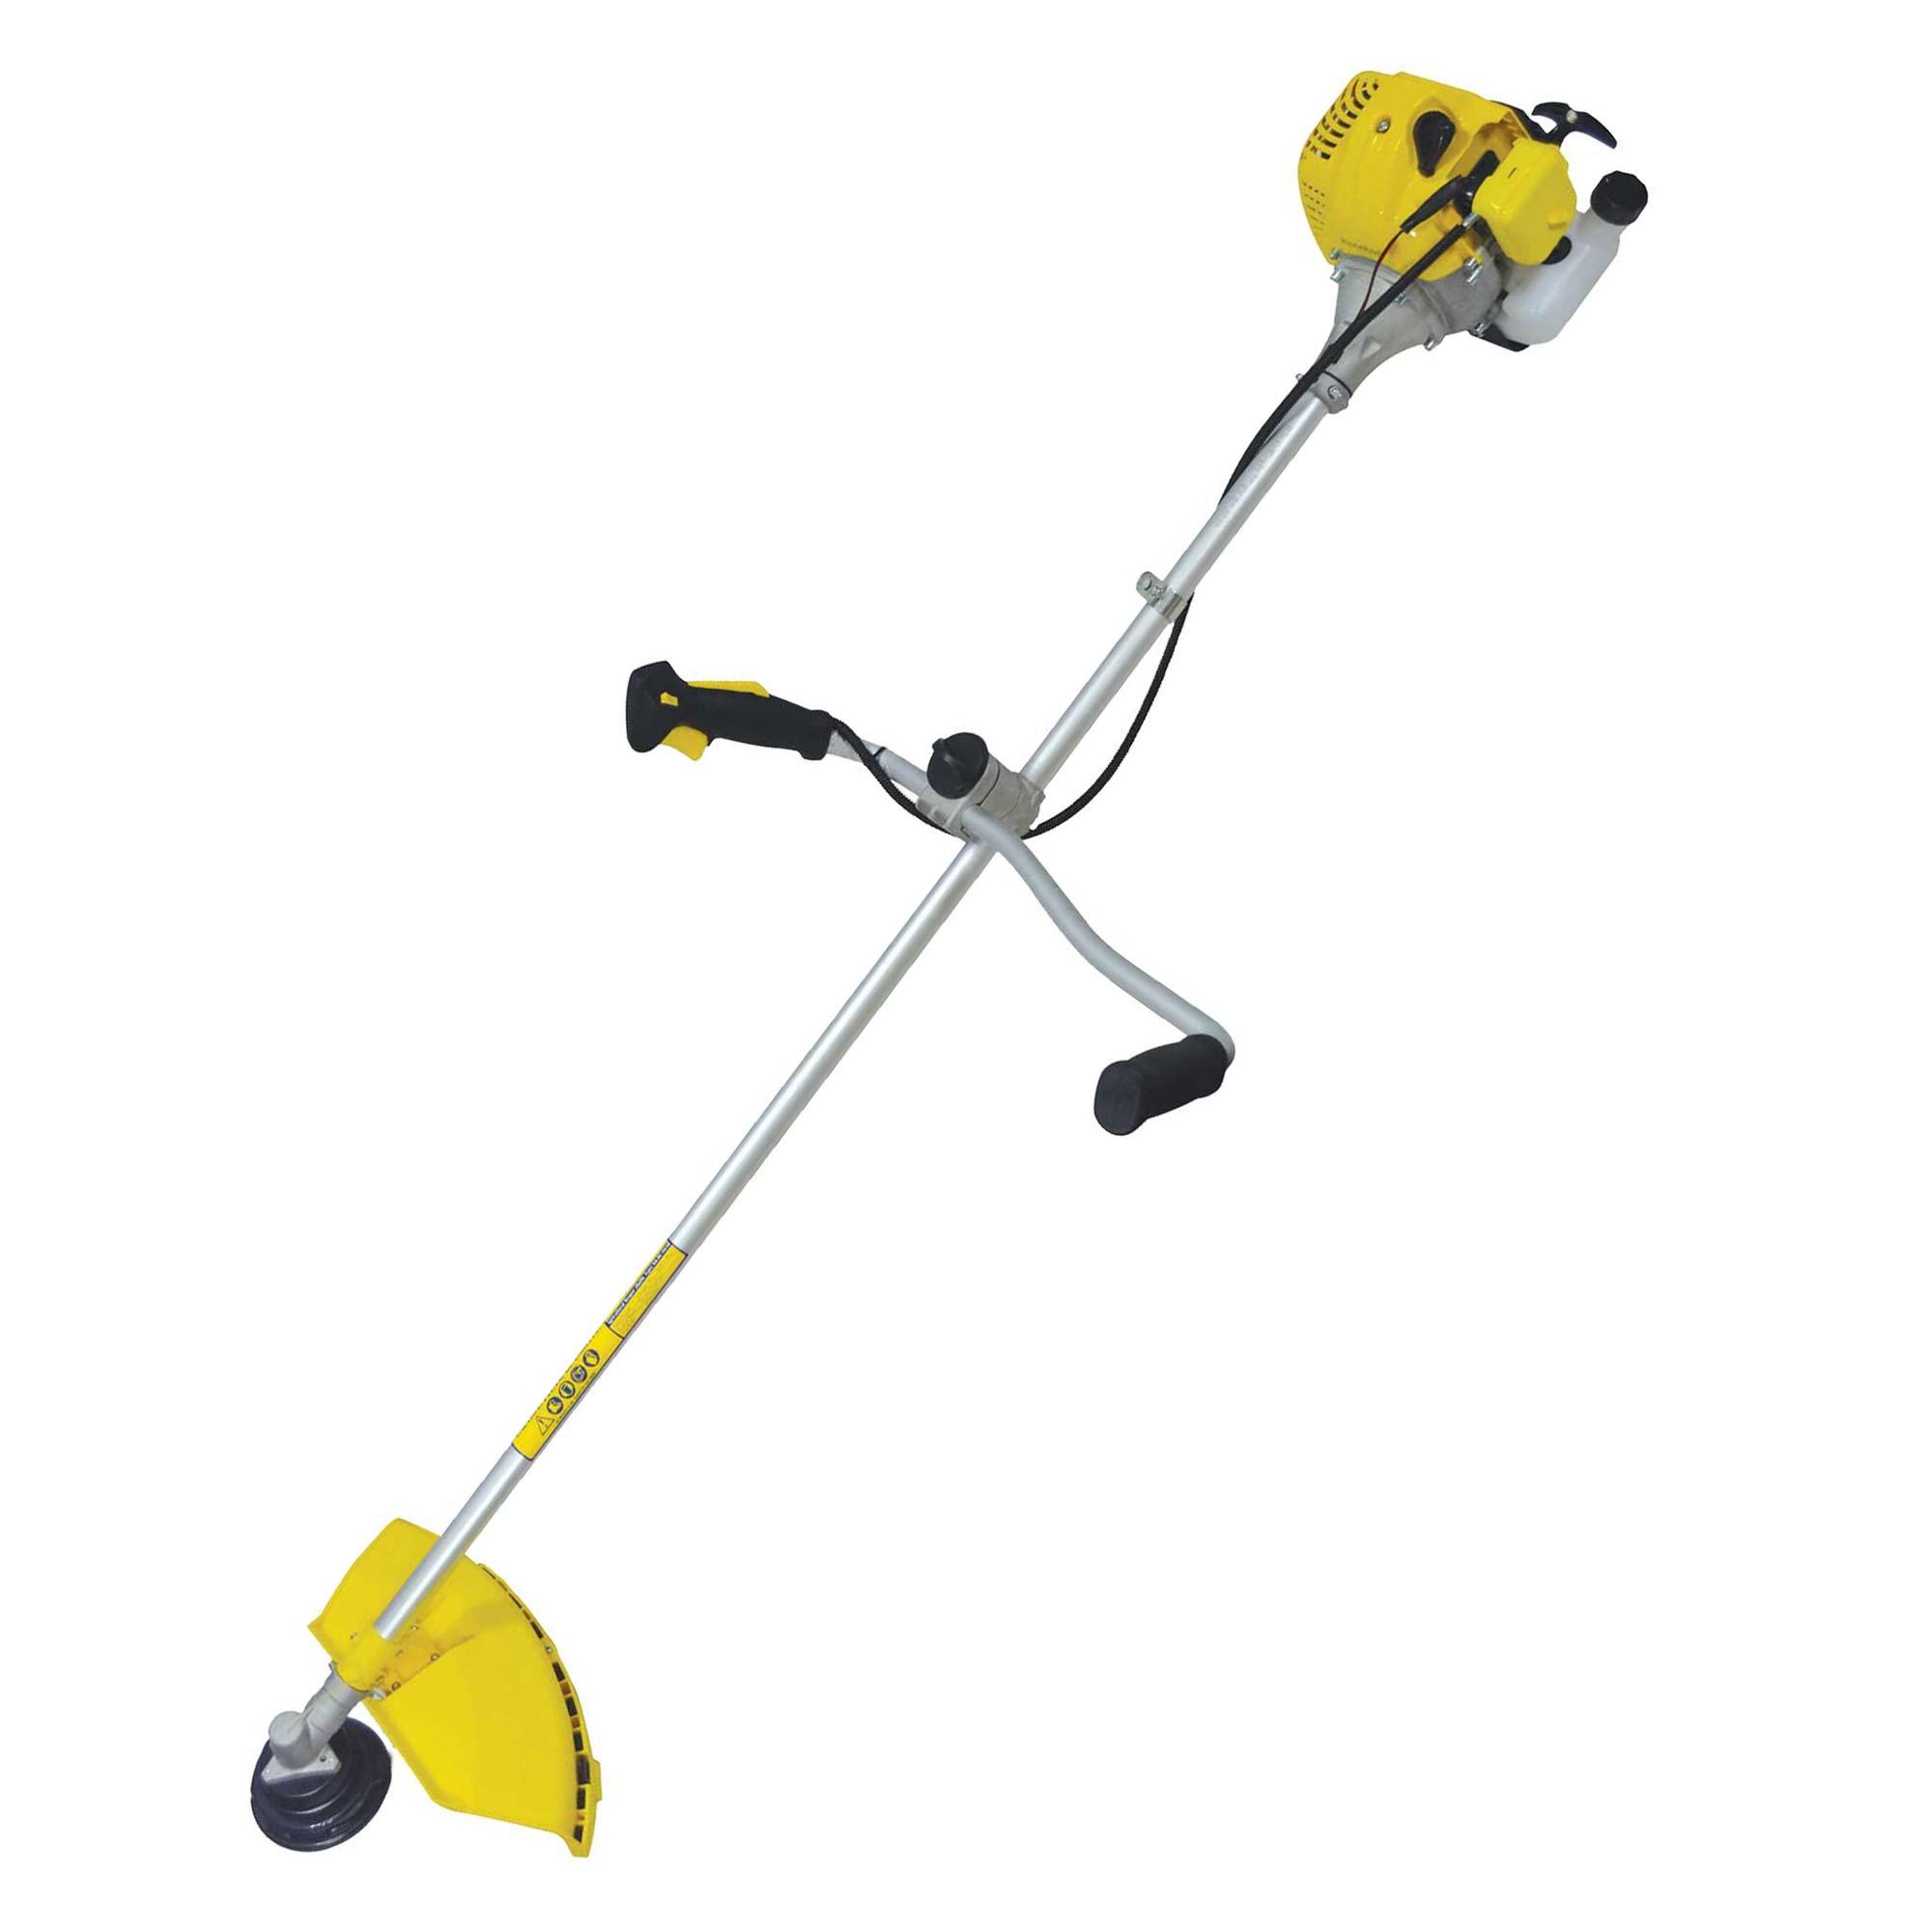 KisanKraft Brush Cutter KK-BC-8640 2 Stroke Petrol